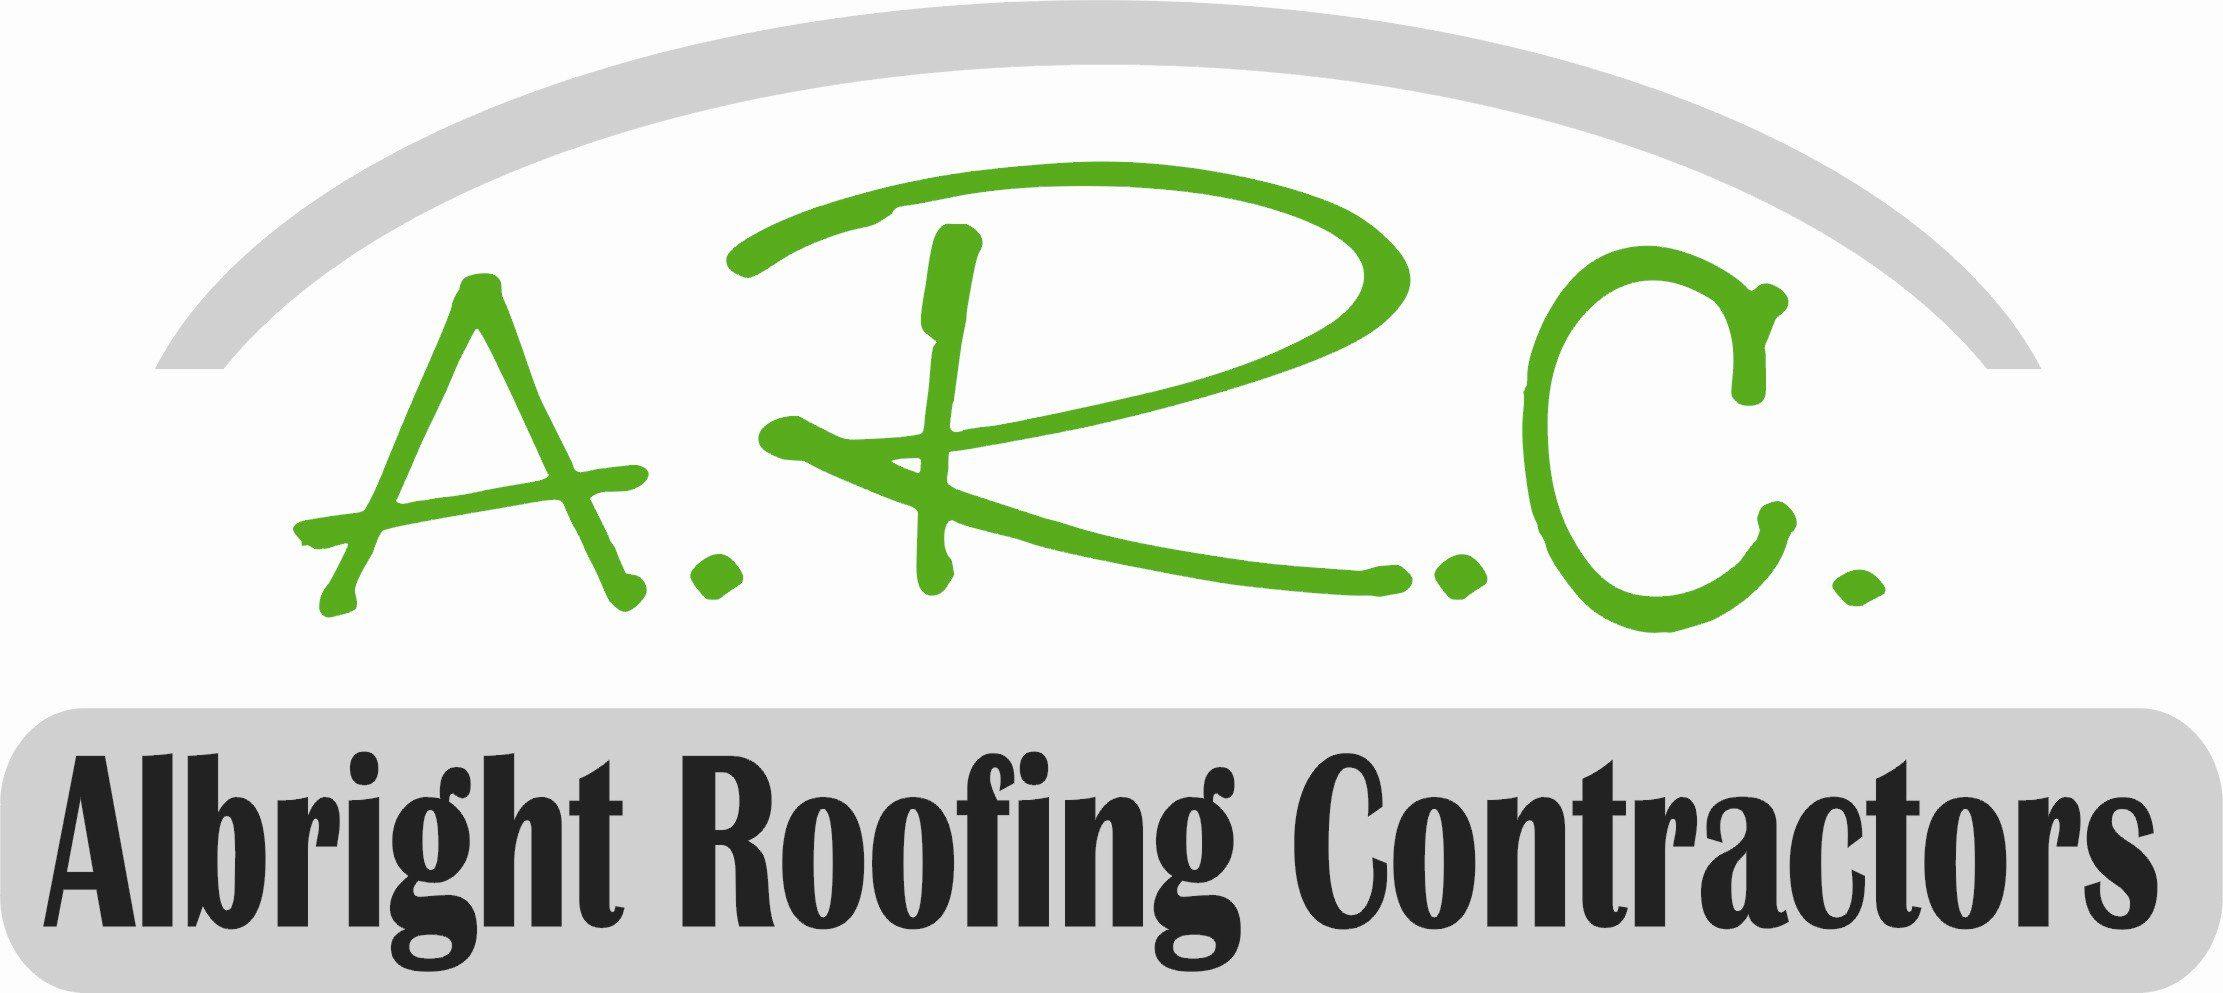 Albright Roofing Contractors